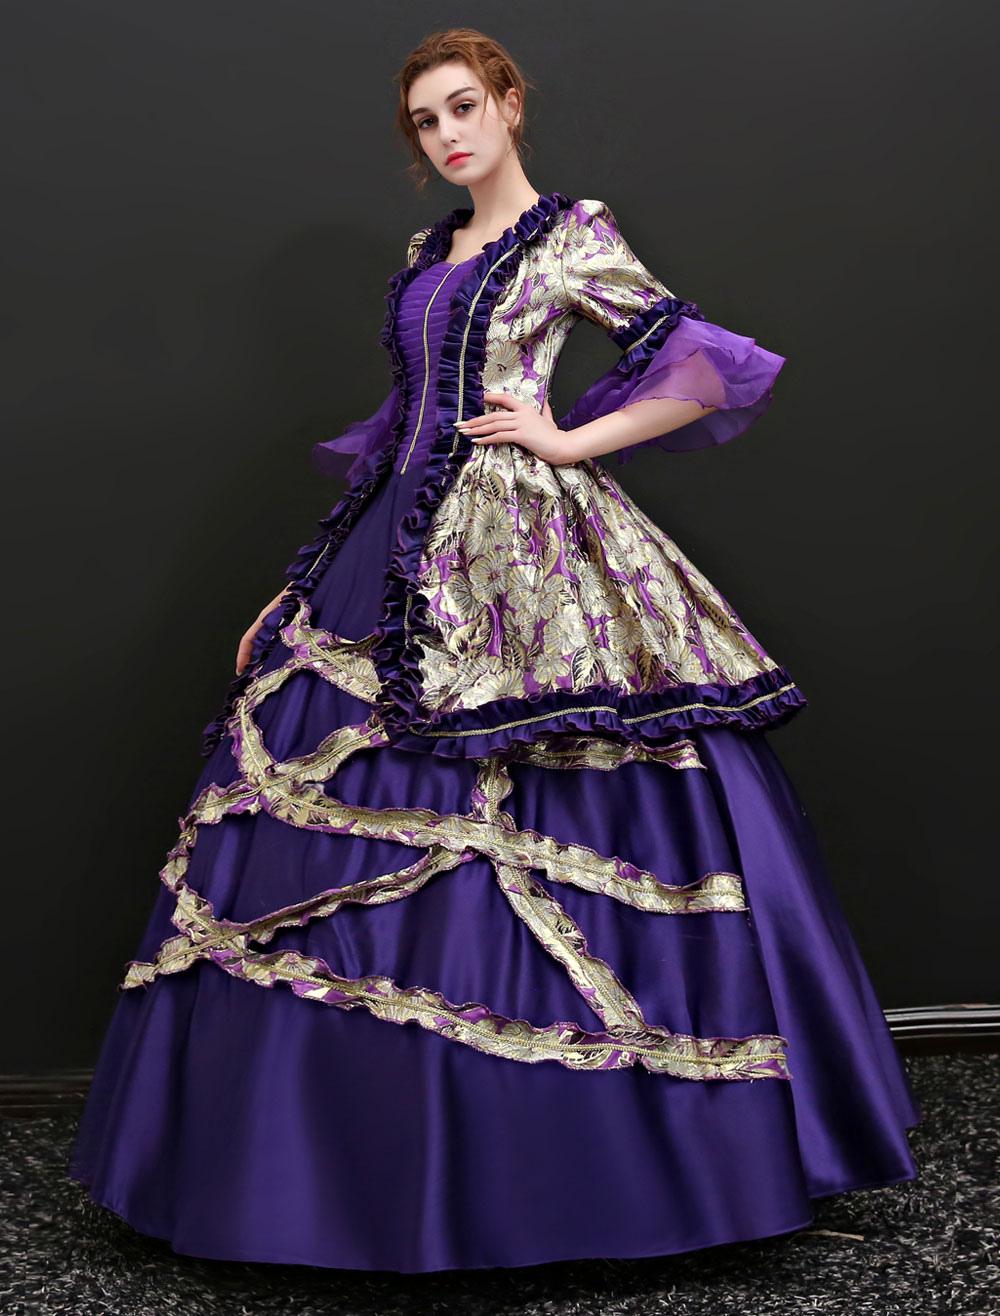 eaff71a5789f6 ... Baroque Vintage Costume Halloween Deep Purple Dress For Women-No.2 ...